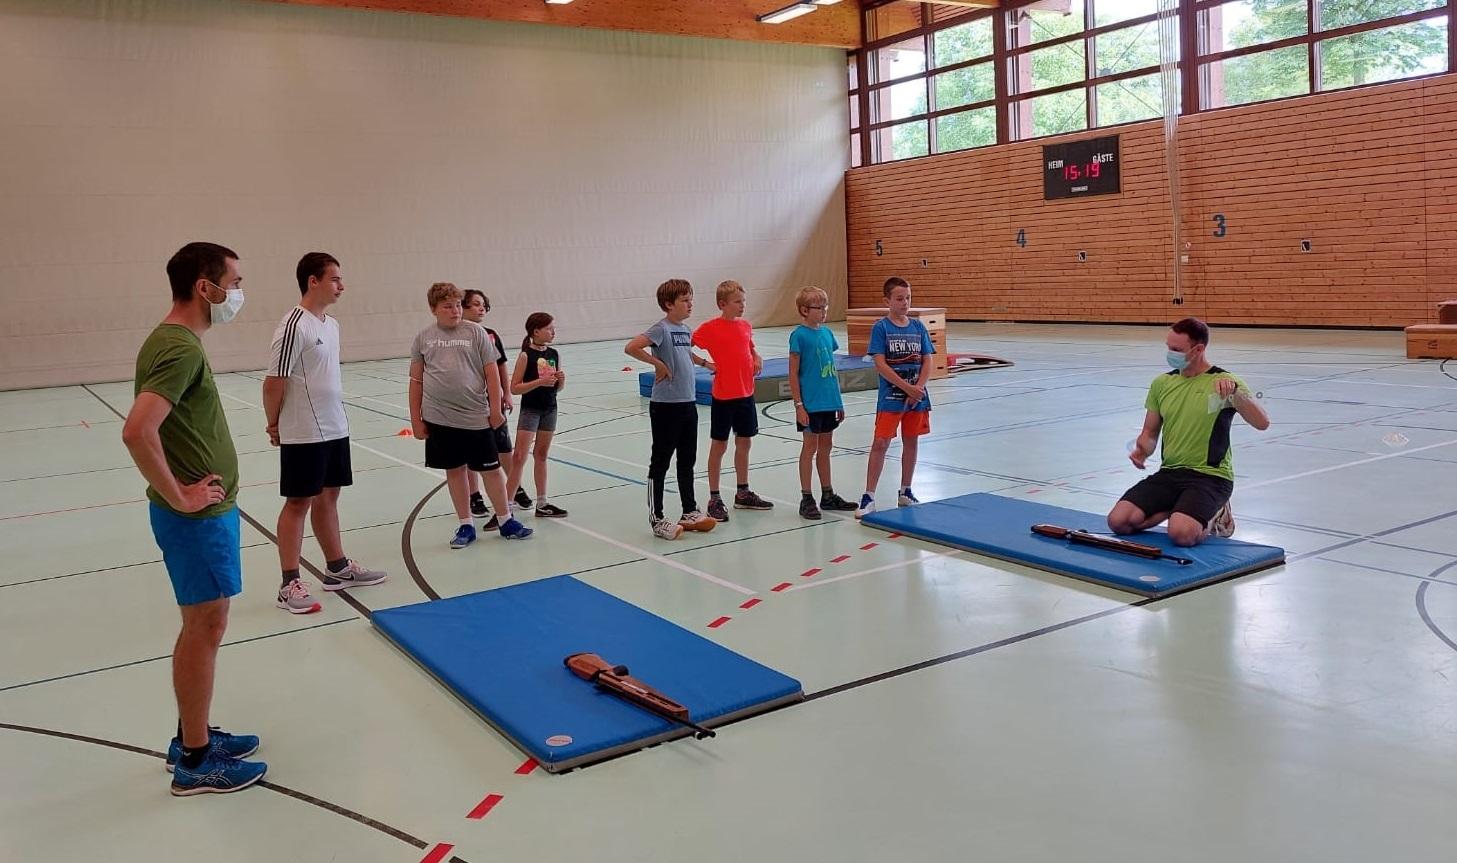 Sommerferienprogramm Frickenhausen Sommerbiathlon